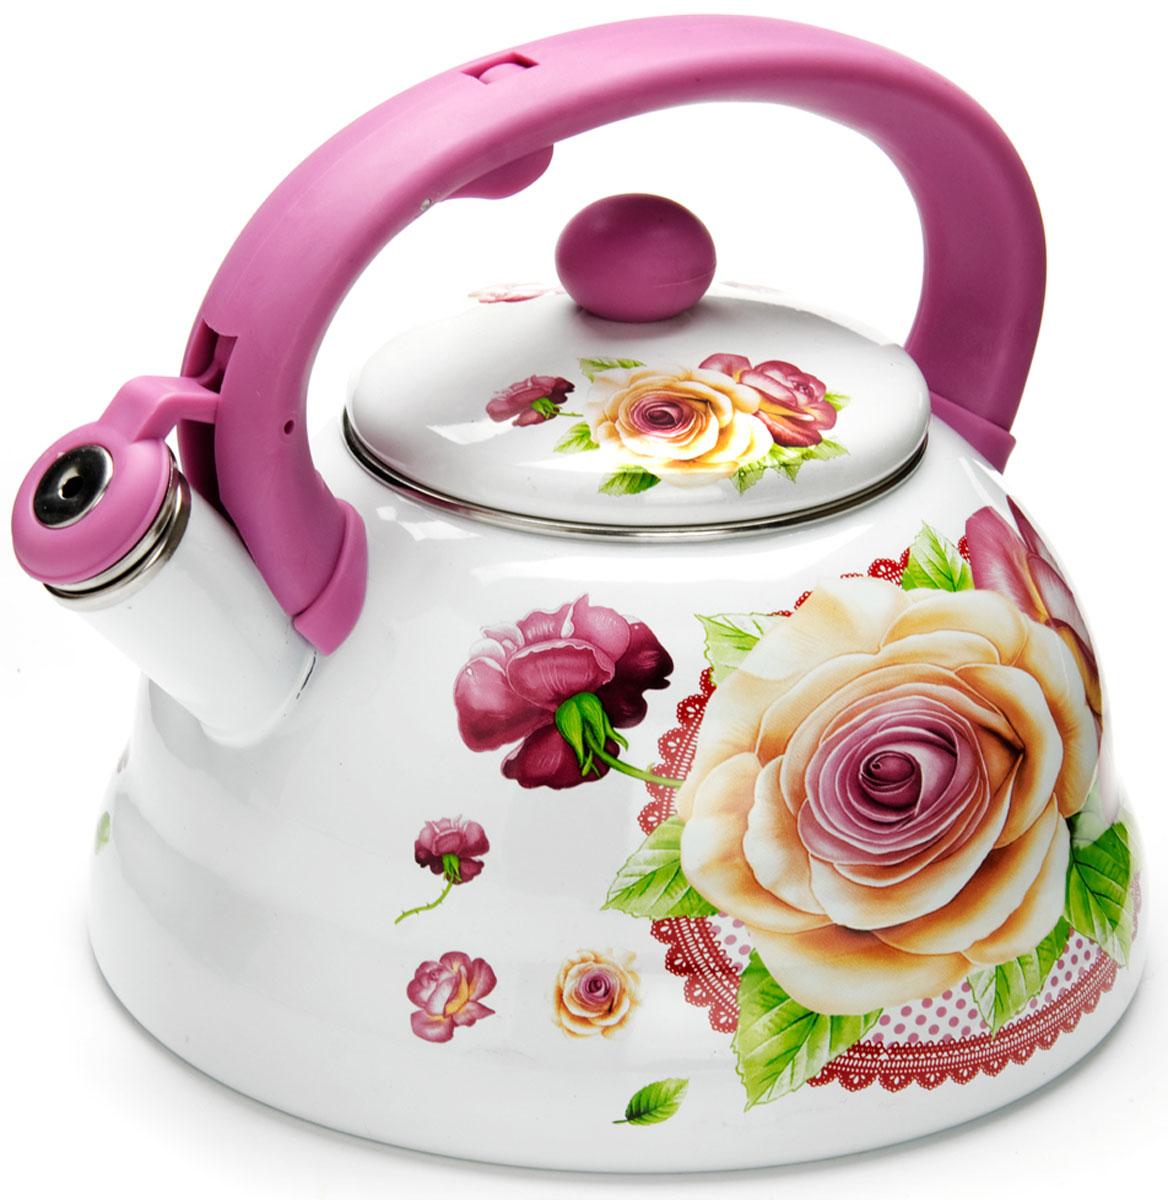 Чайник Mayer & Boch Розы, со свистком, 3 л. 2625626256